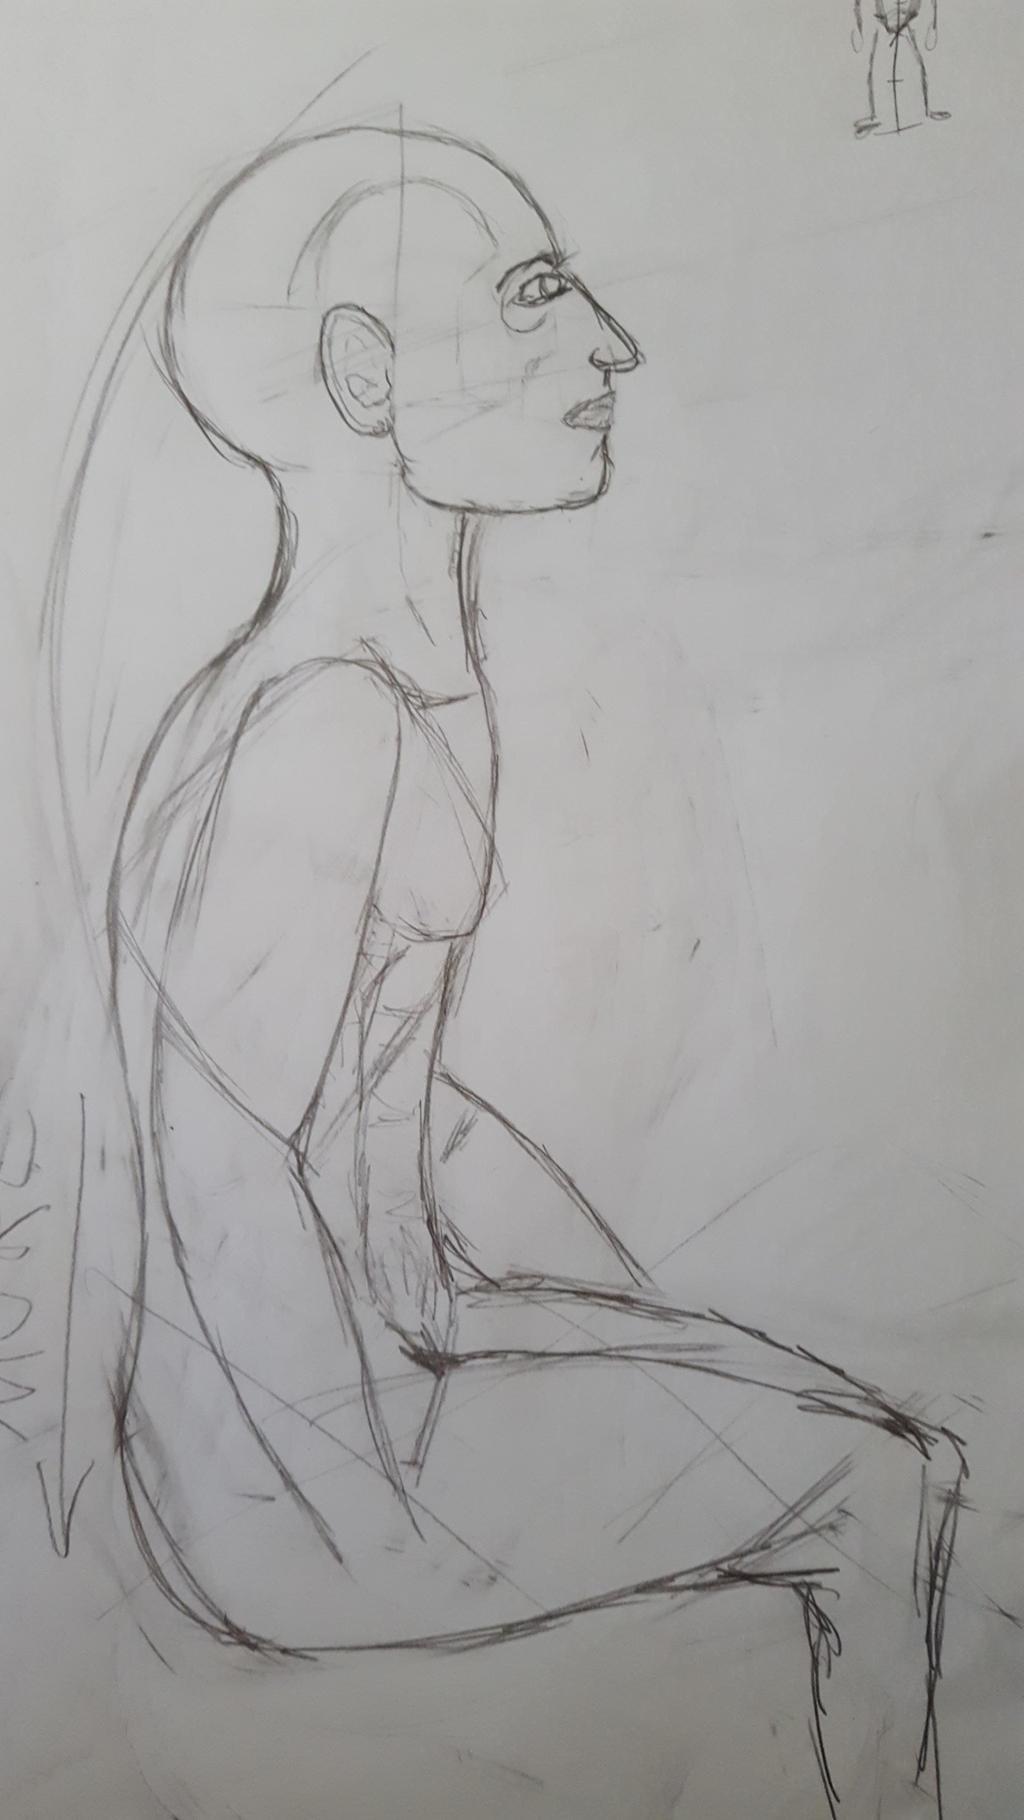 Human body exercise by kestovaari